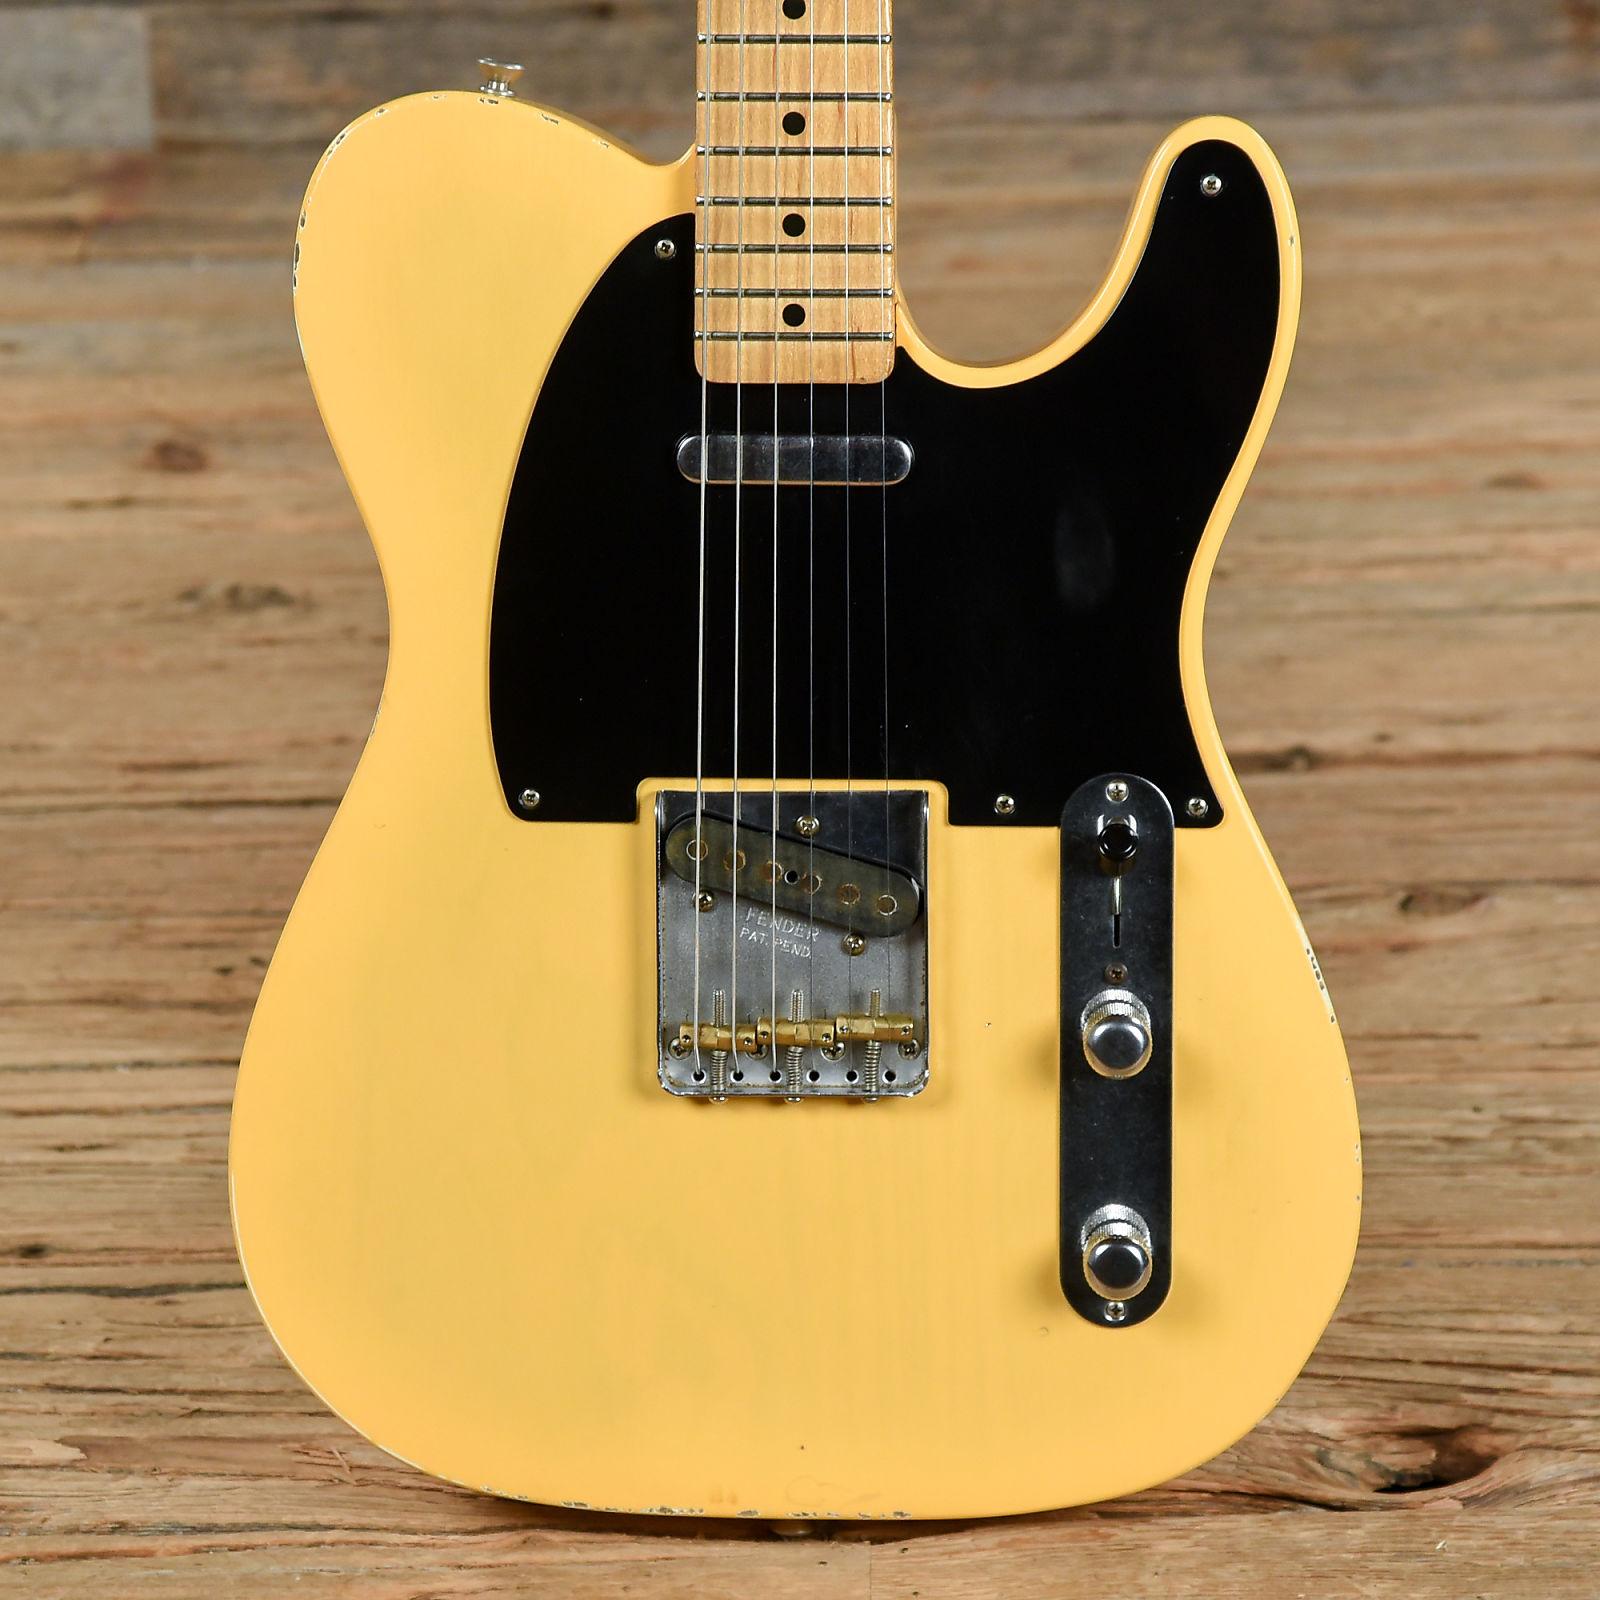 Fender Road Worn 50s Telecaster Blonde 2016 S892